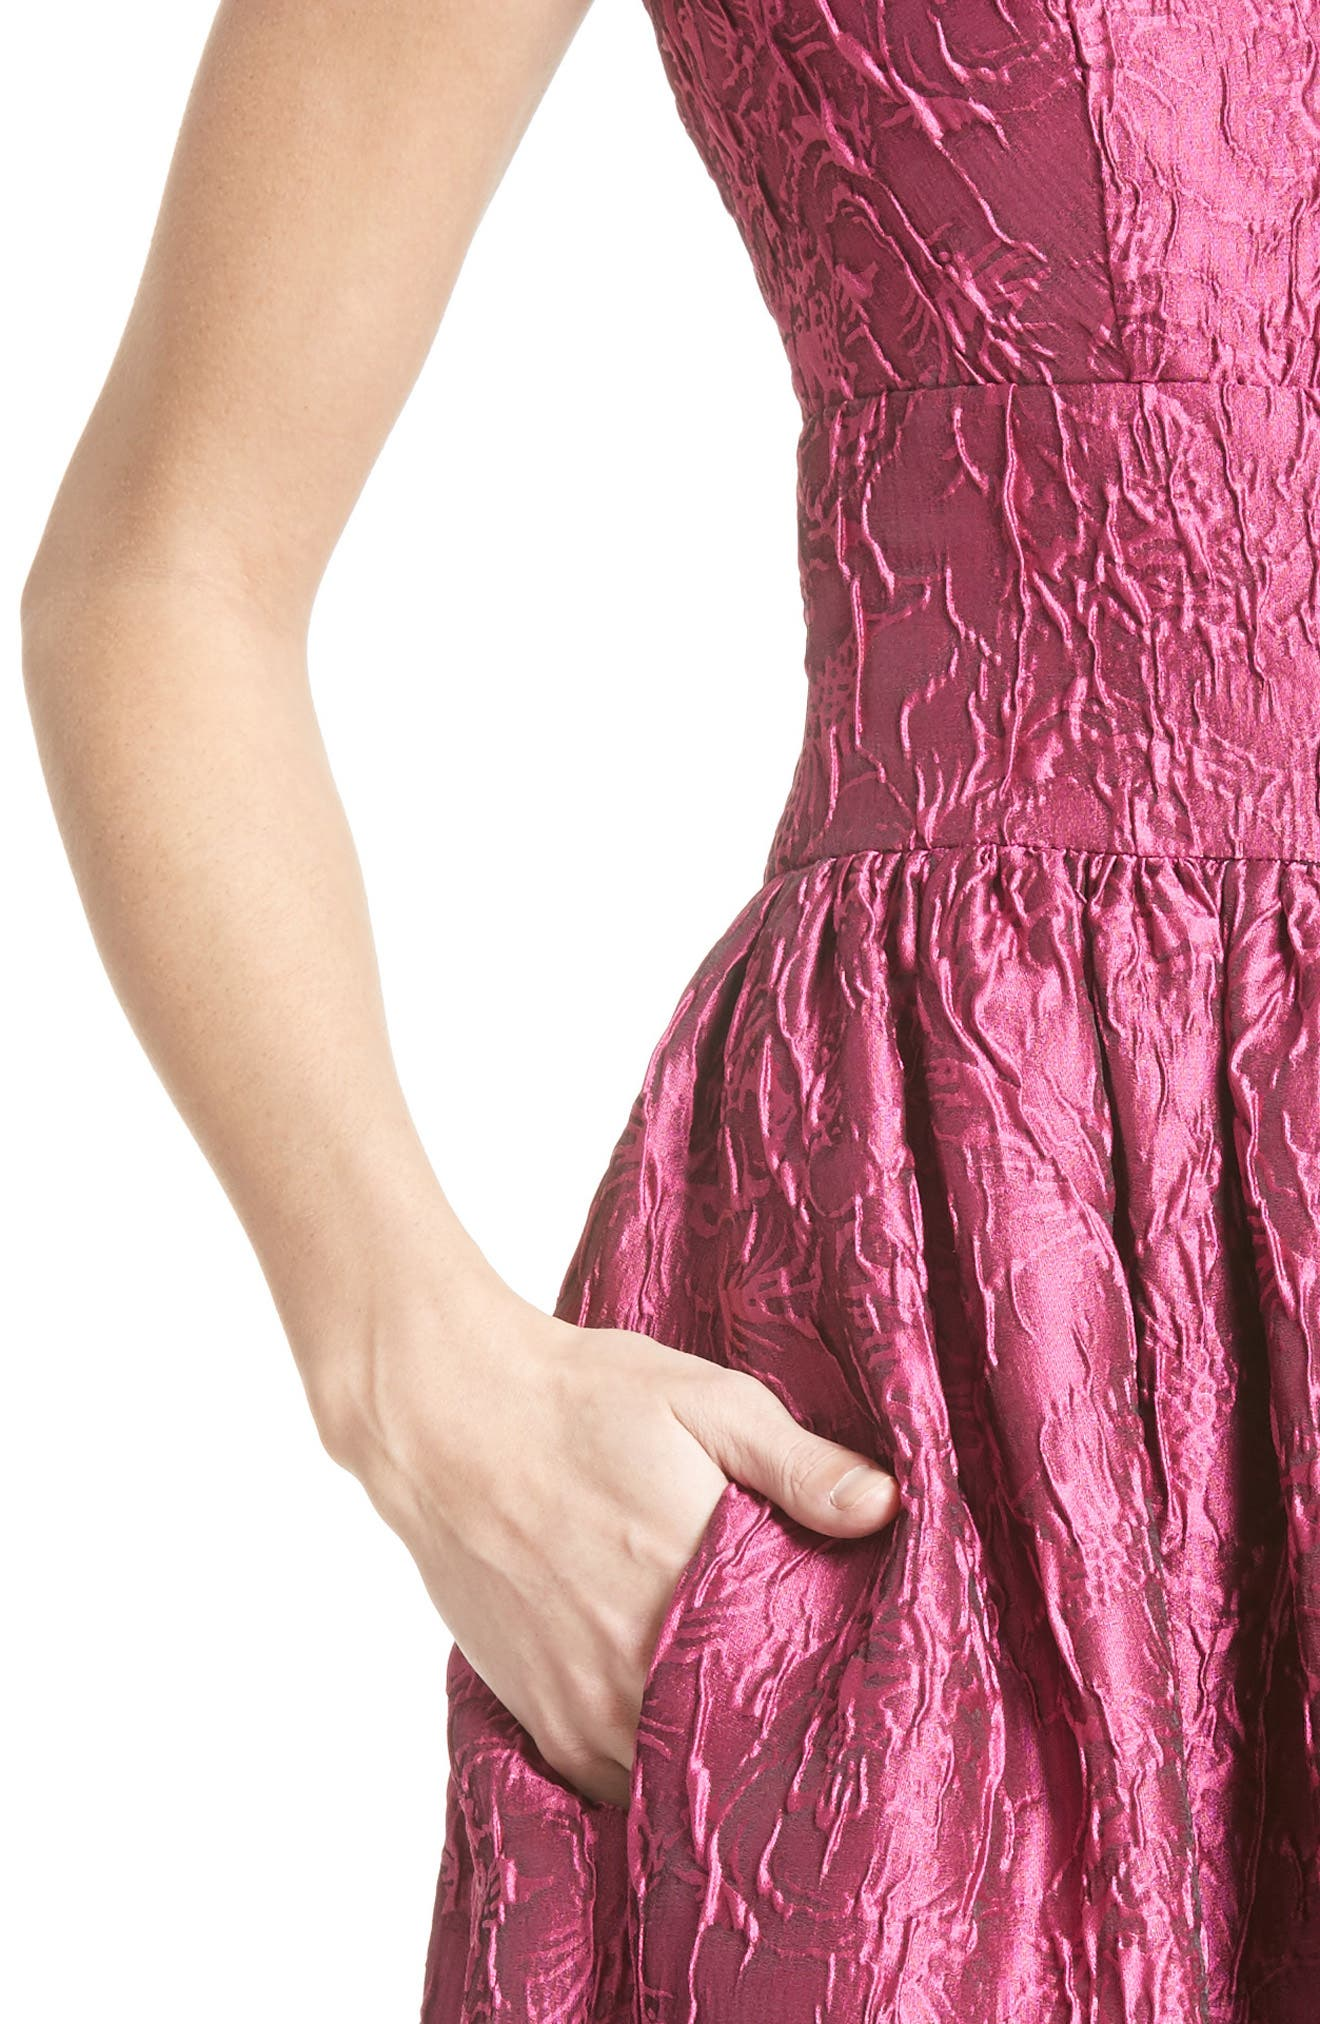 BADGLEY MISCHKA COUTURE., Badgley Mischka Couture Cap Sleeve Brocade Party Dress, Alternate thumbnail 5, color, 652